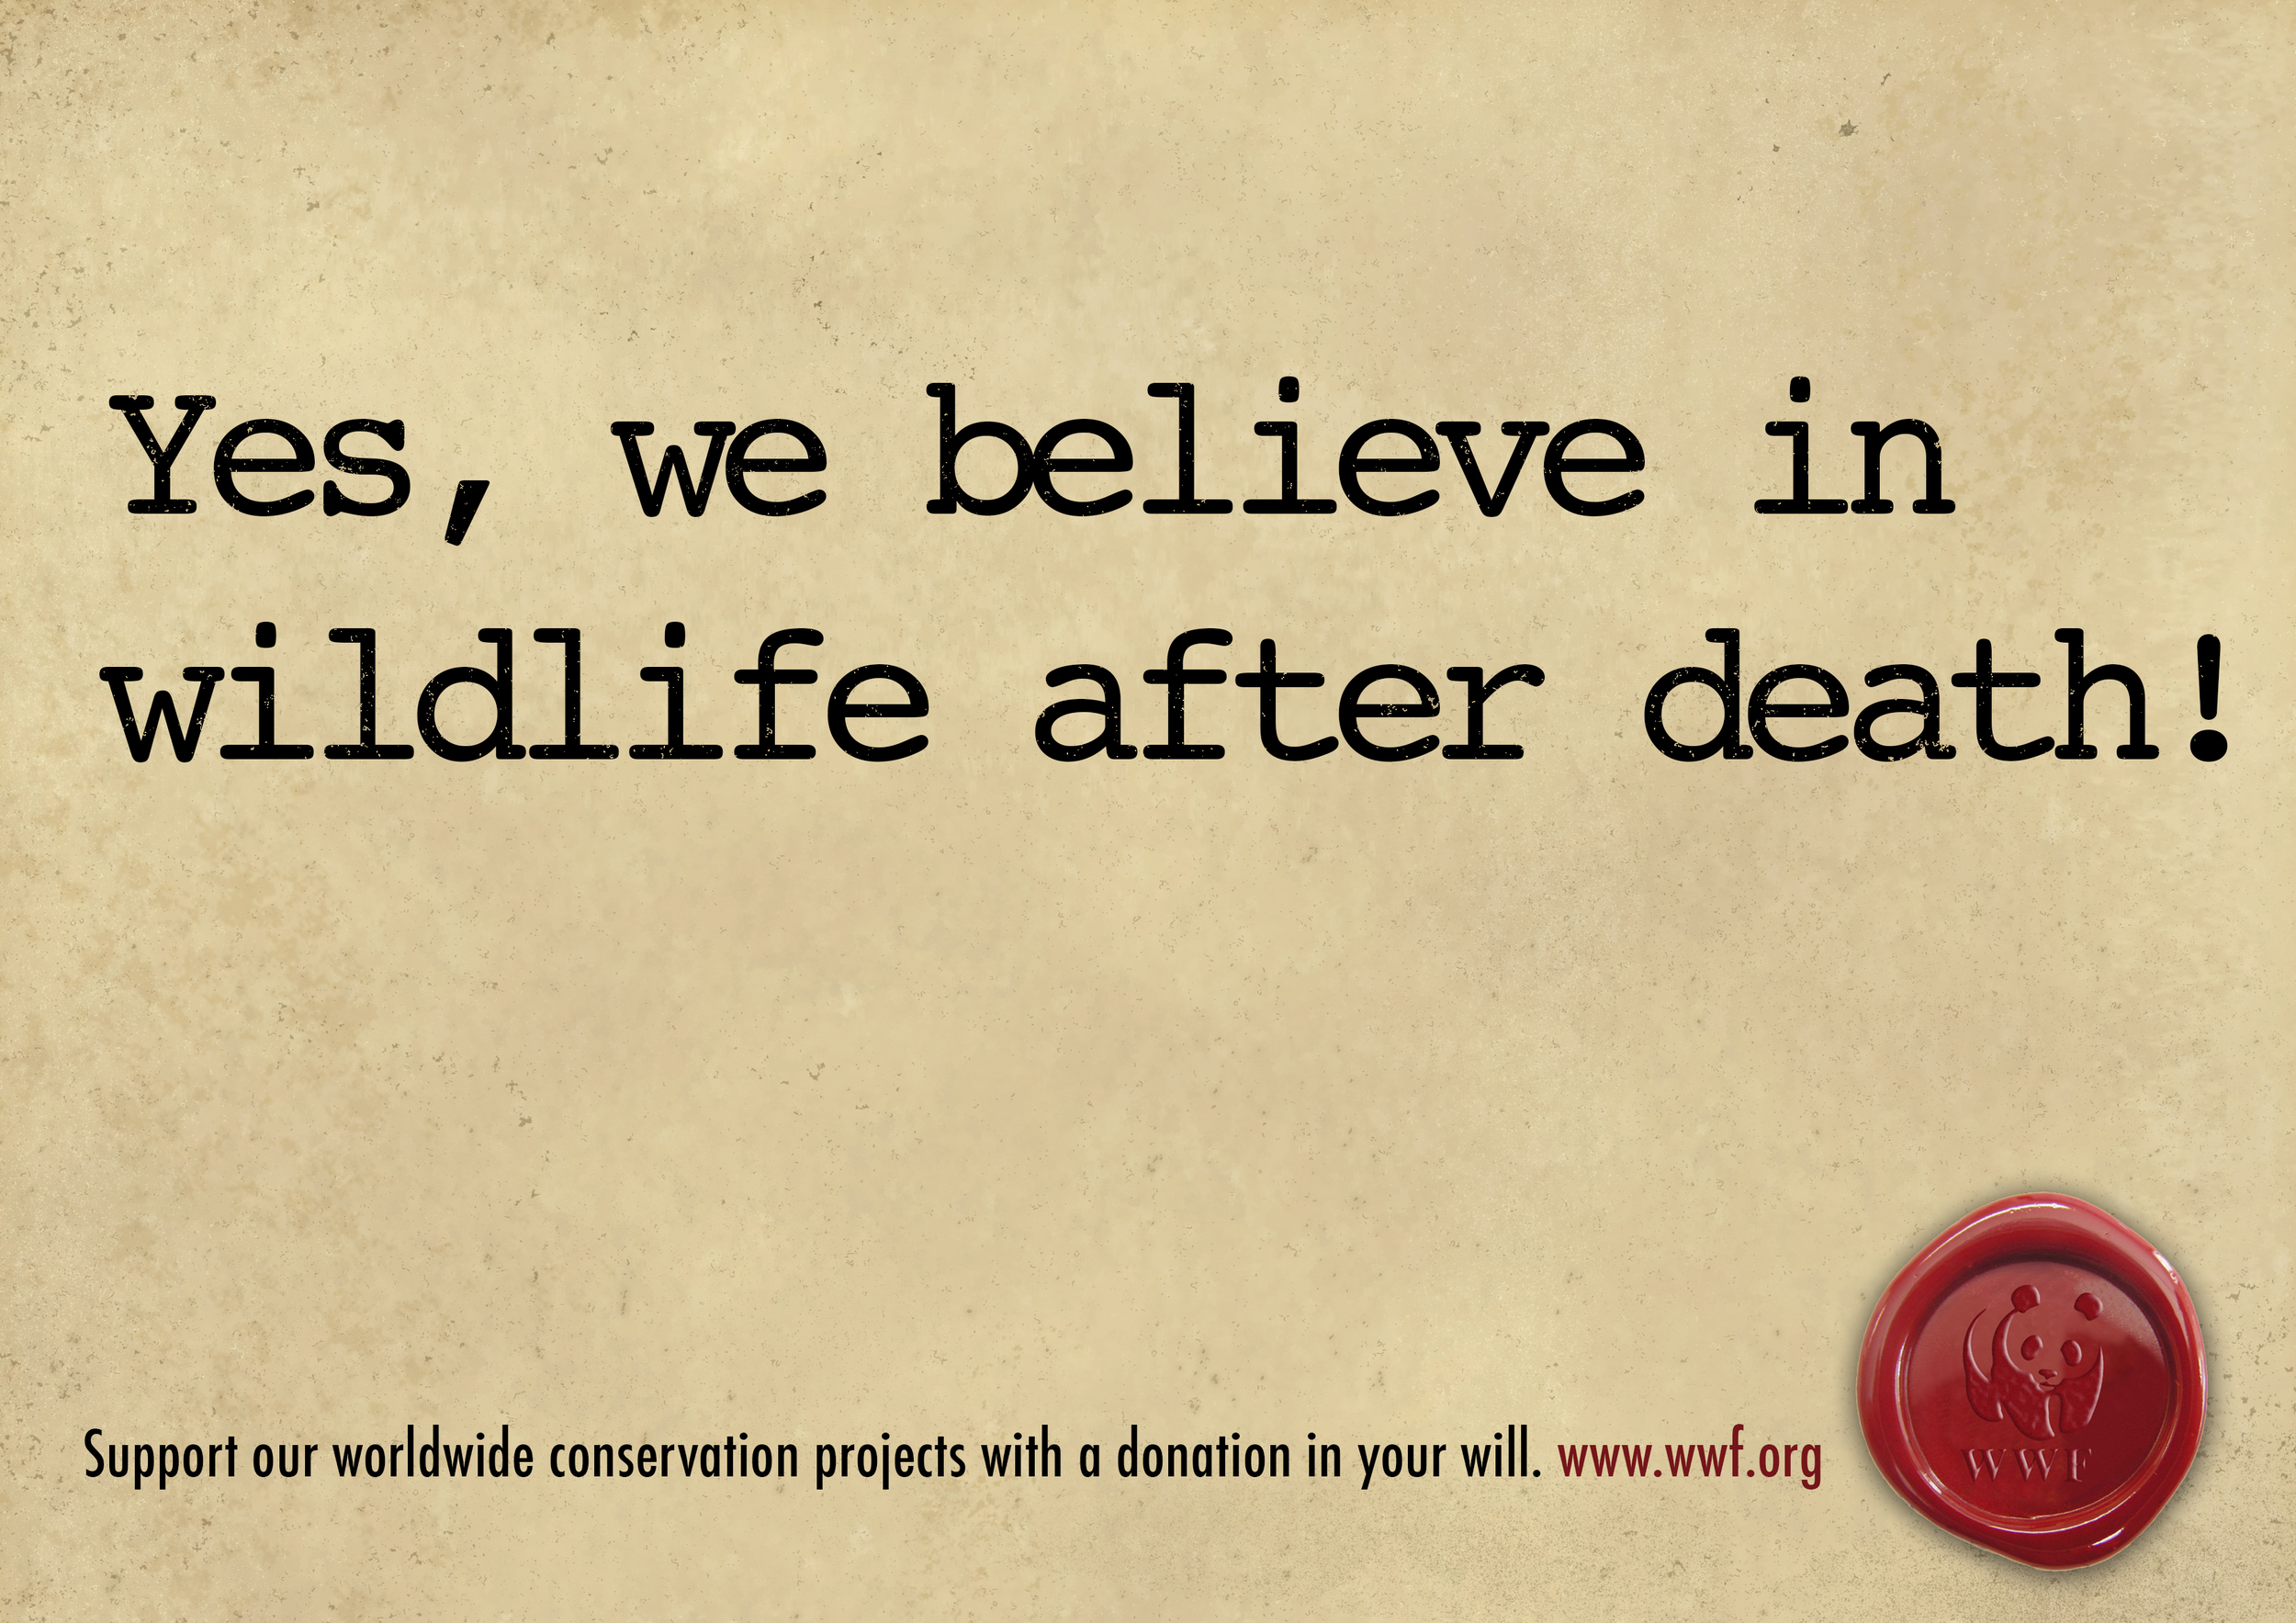 WWF_will_2.jpg